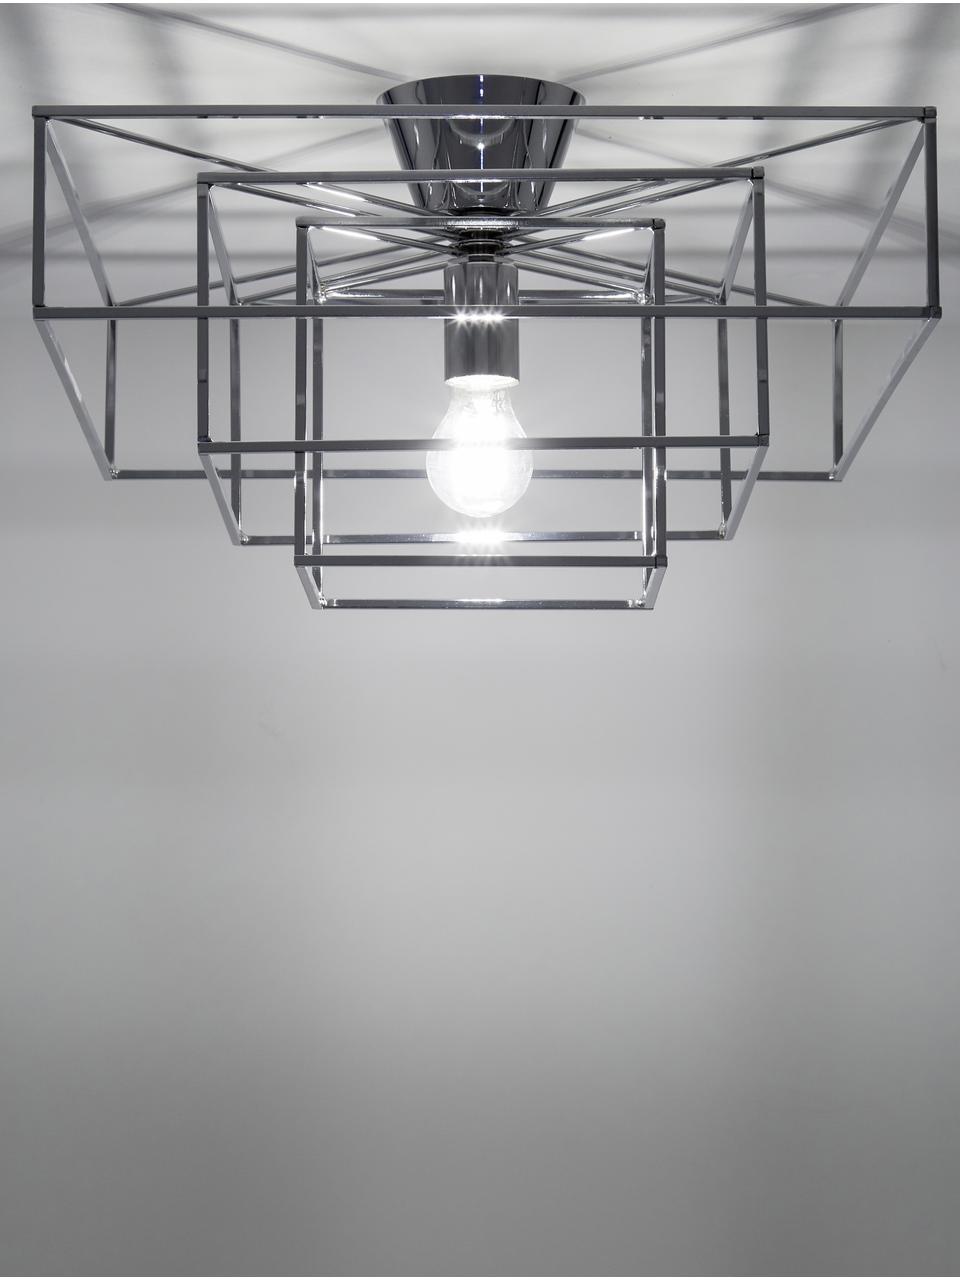 Plafondlamp Cube in chroomkleurig, Verchroomd messing, Chroomkleurig, 46 x 27 cm